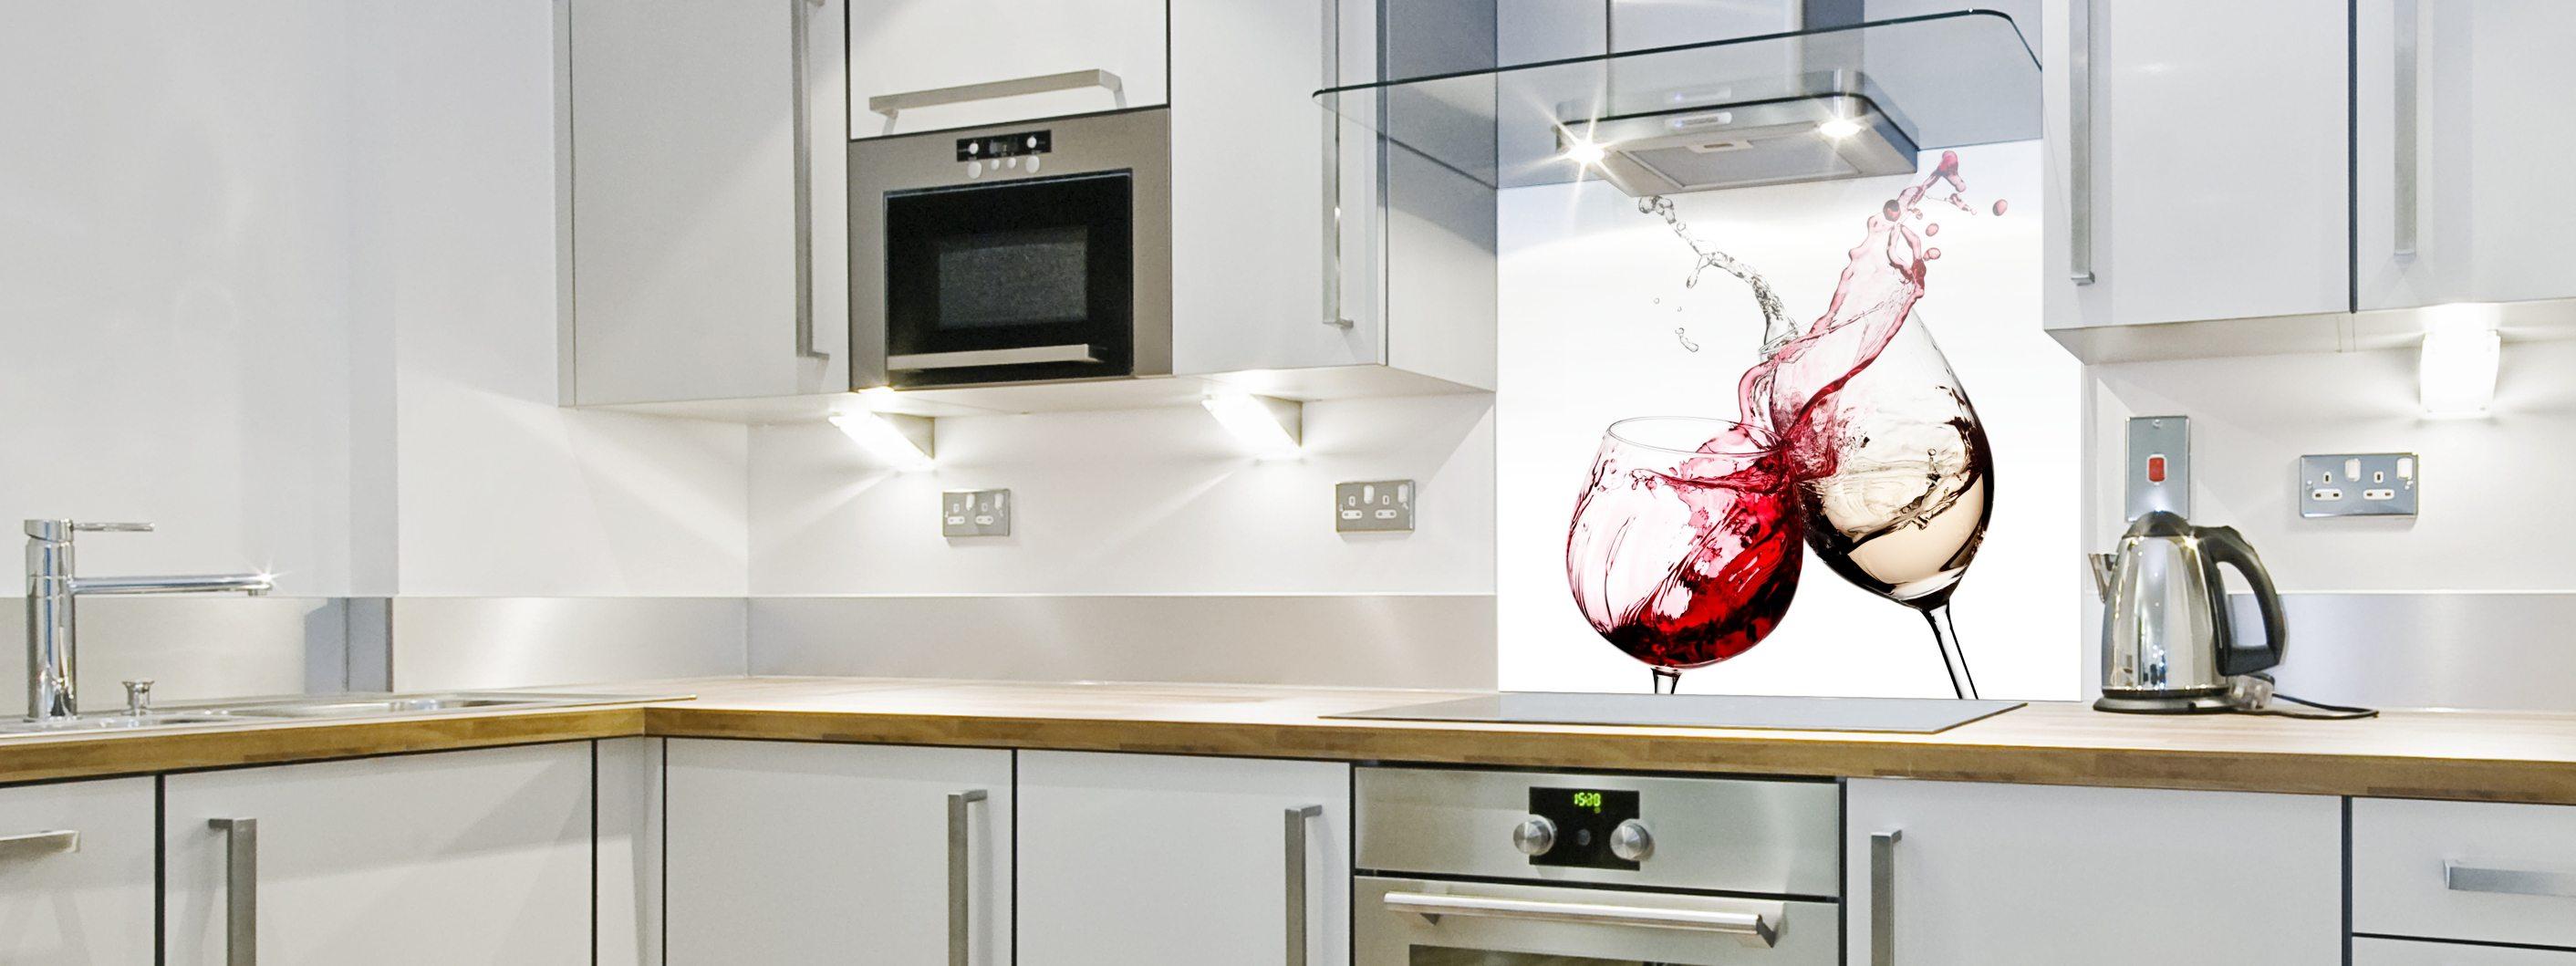 Red Wine Cheers - Printed Splashback